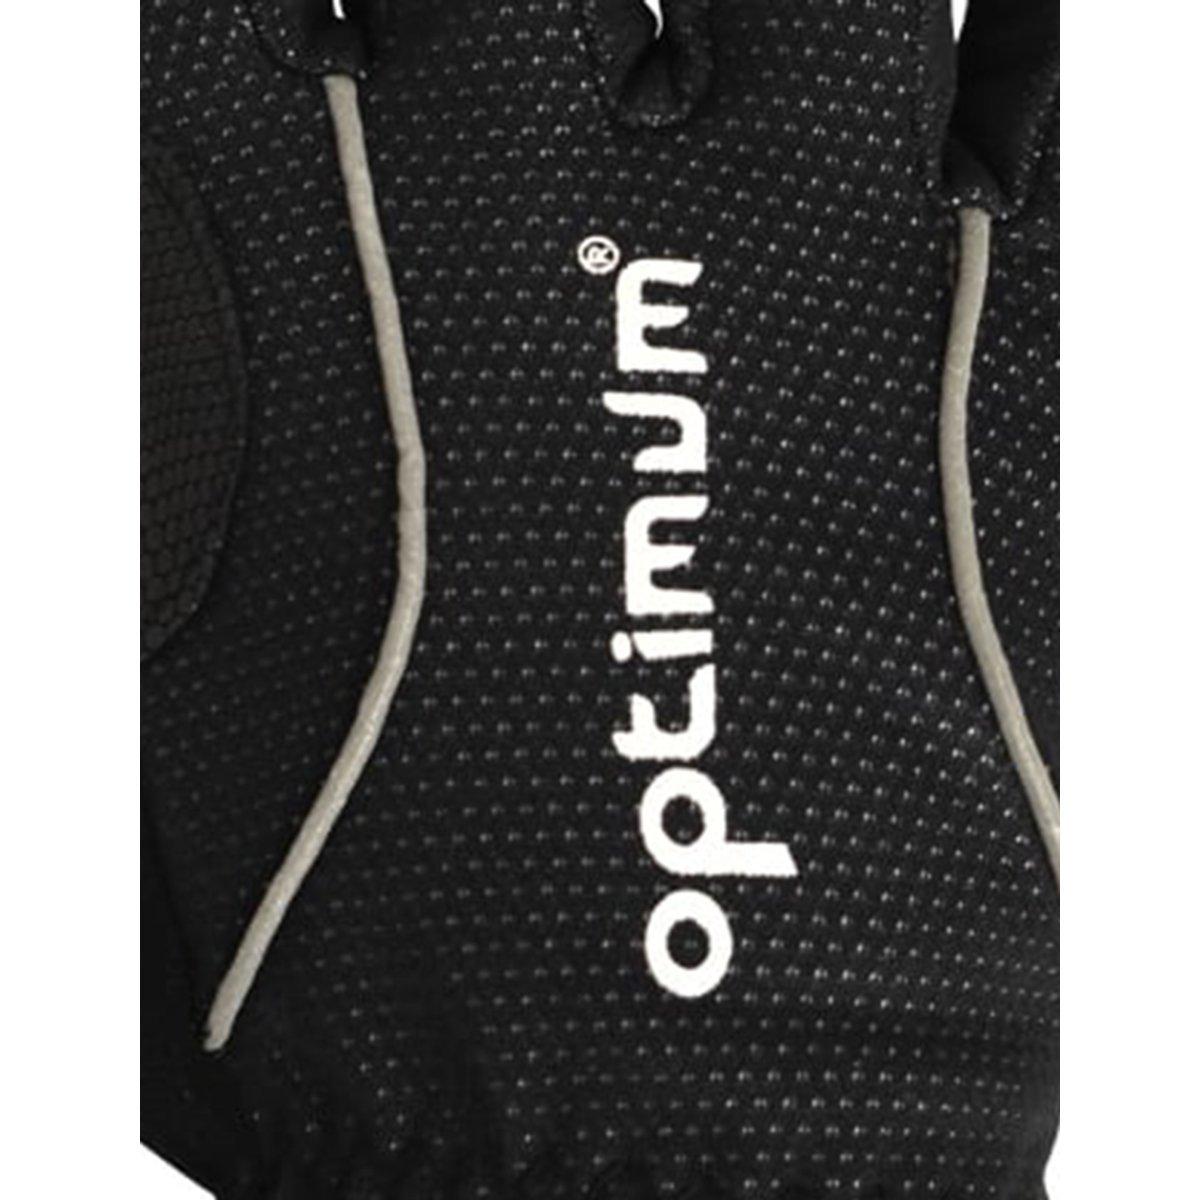 Optimum Boys Hawkley Winter Cycling Gloves